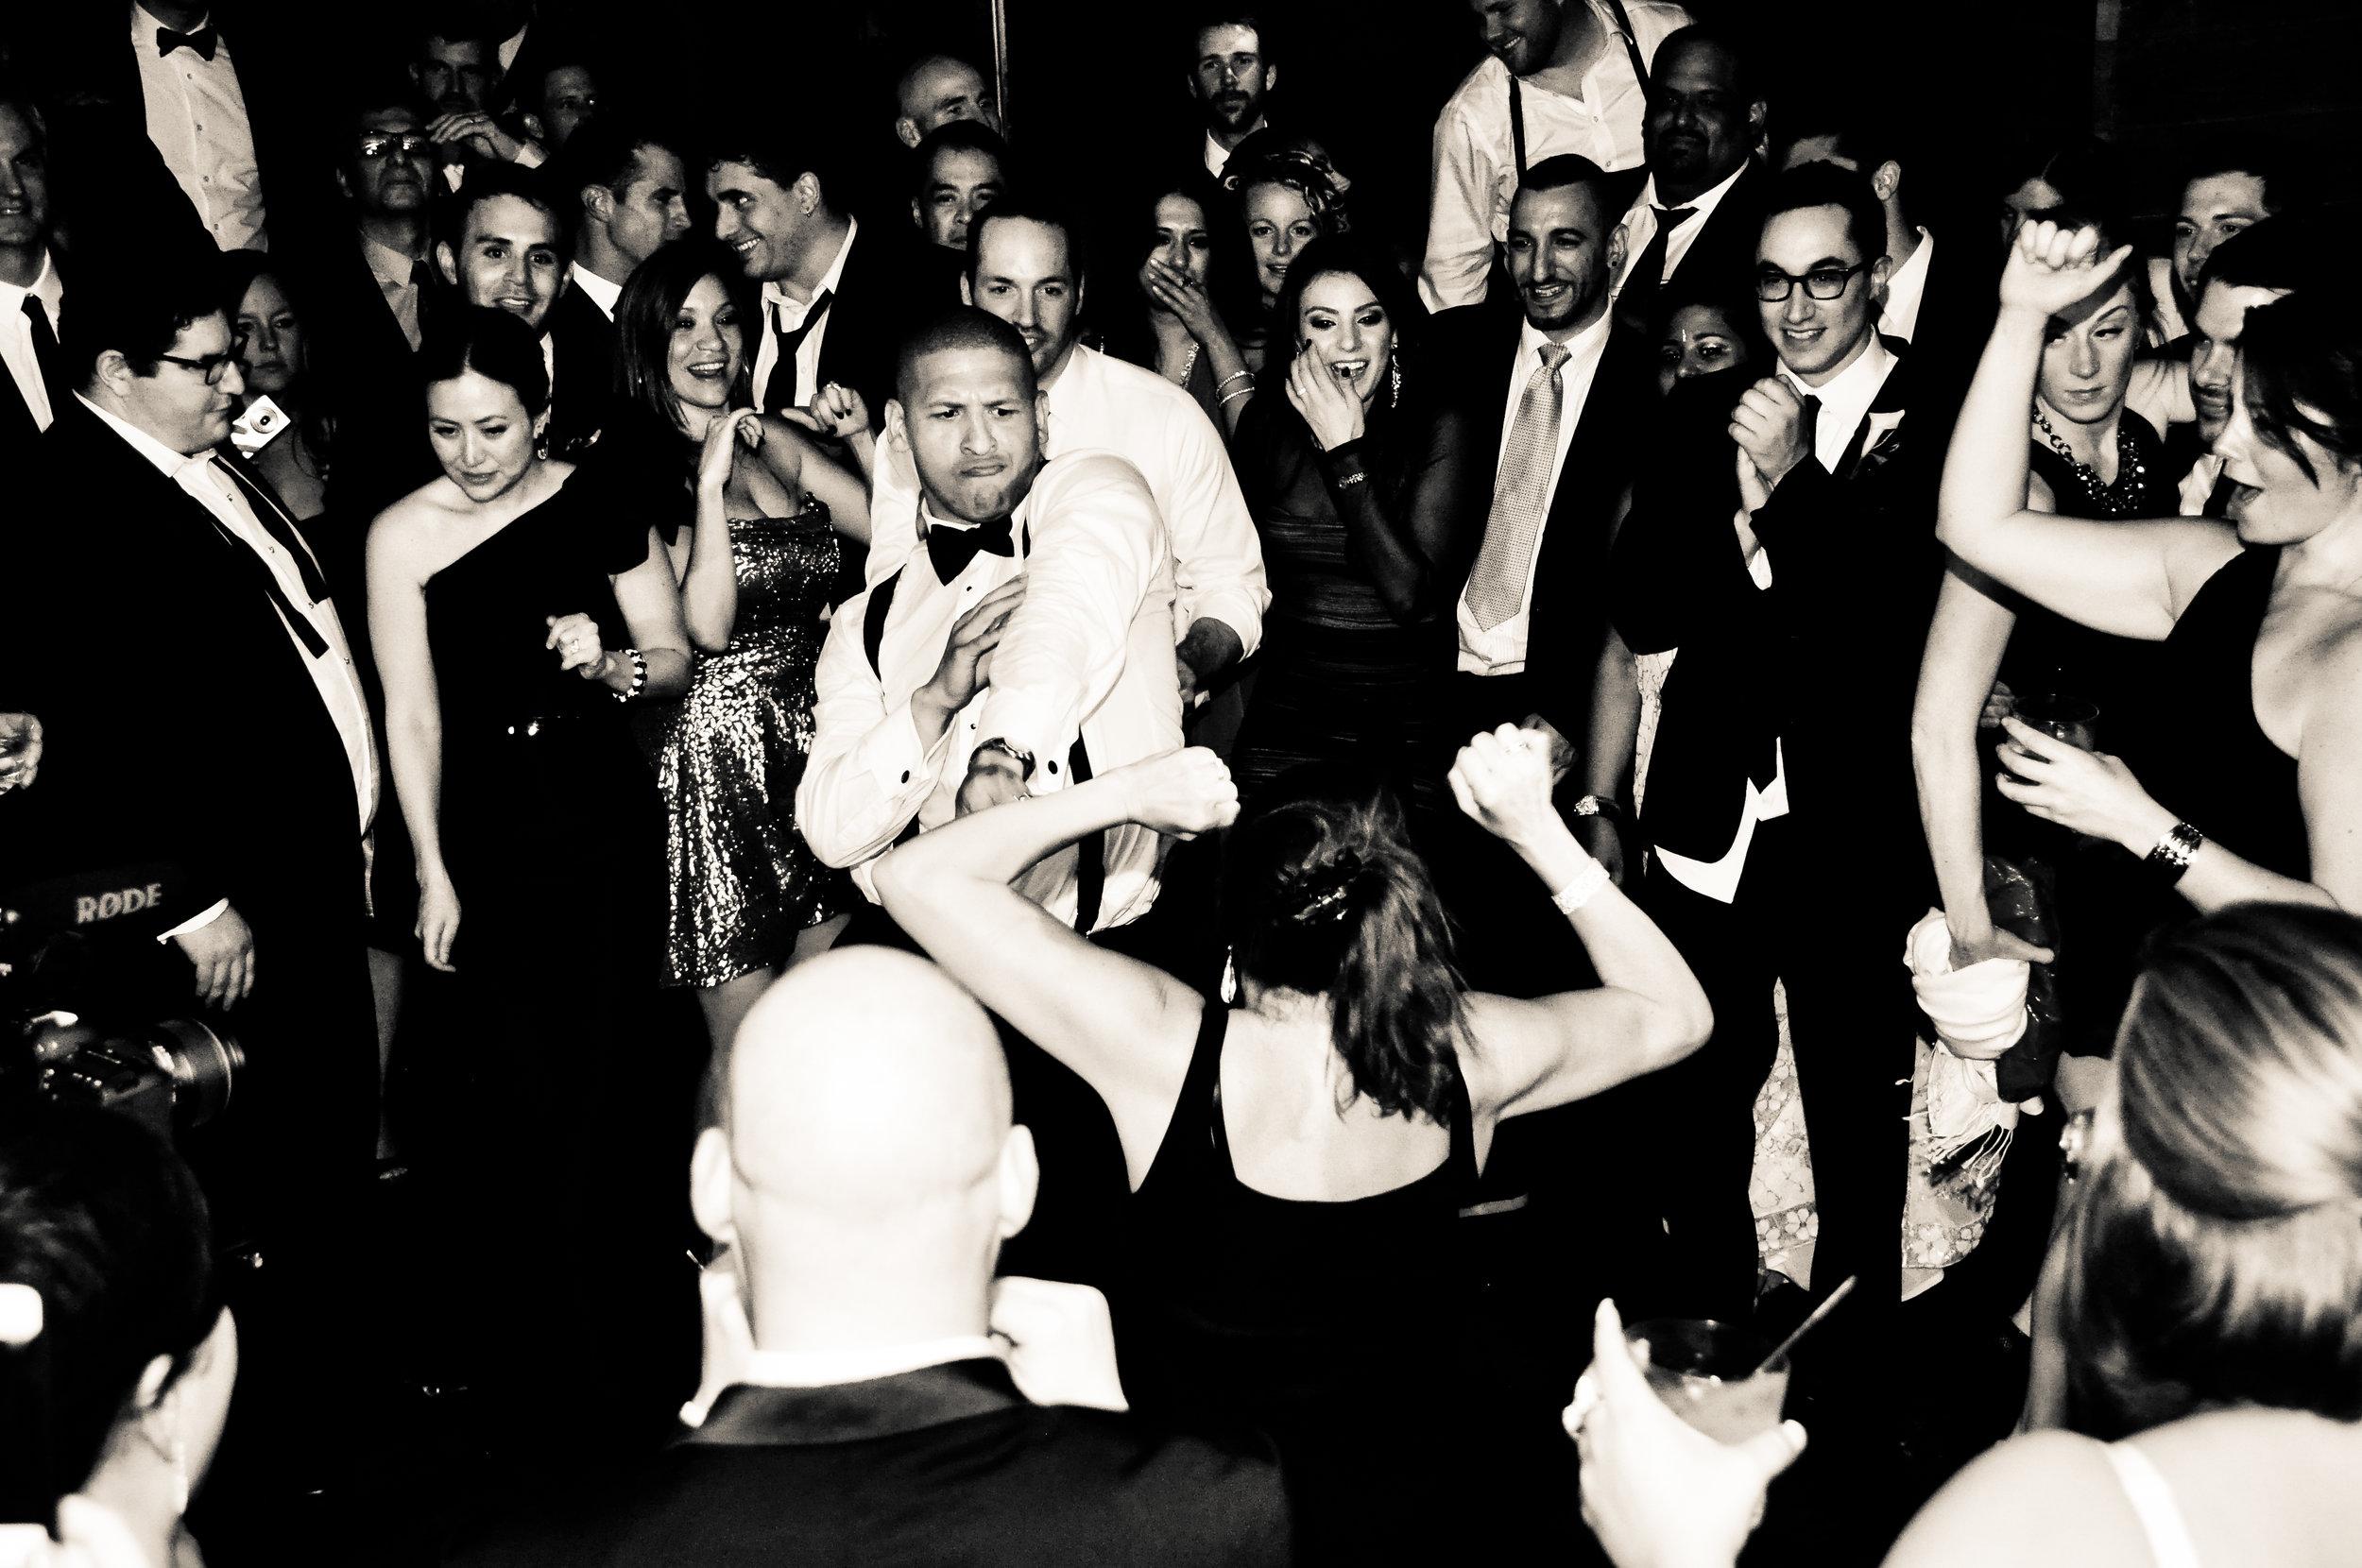 Dance Party-0089.jpg